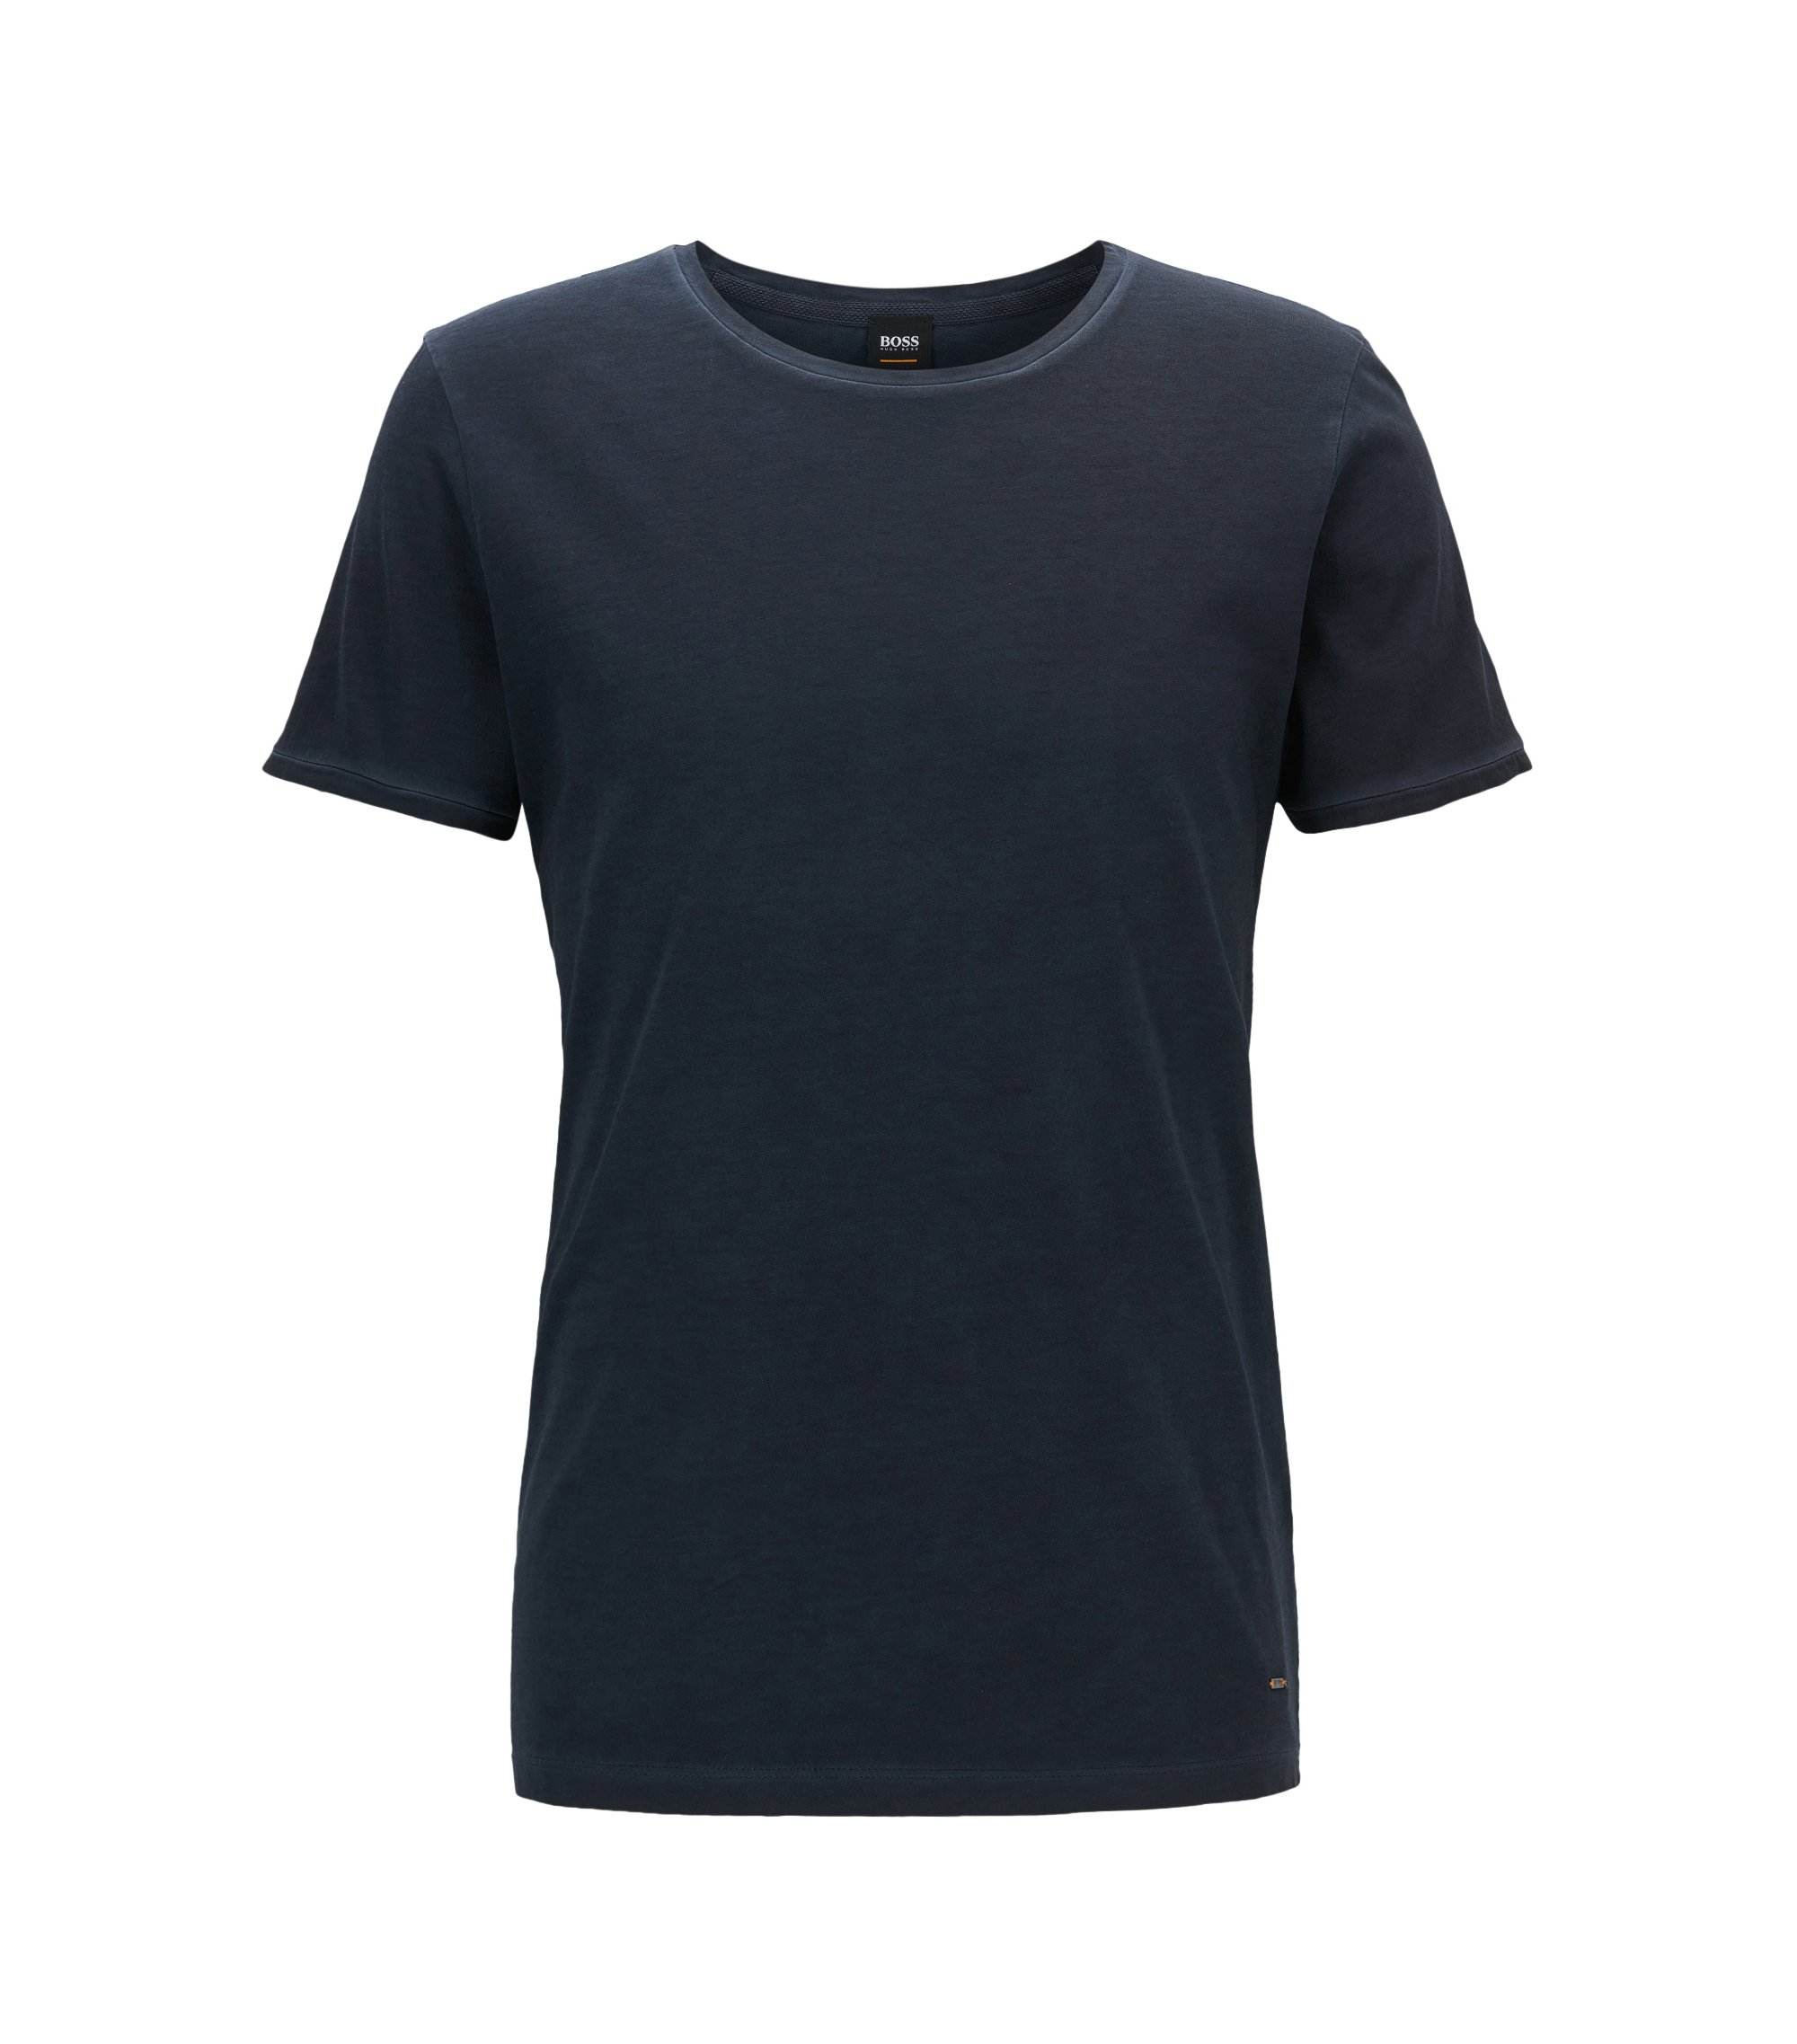 T-shirt Regular Fit en coton teint en pièce, Bleu foncé